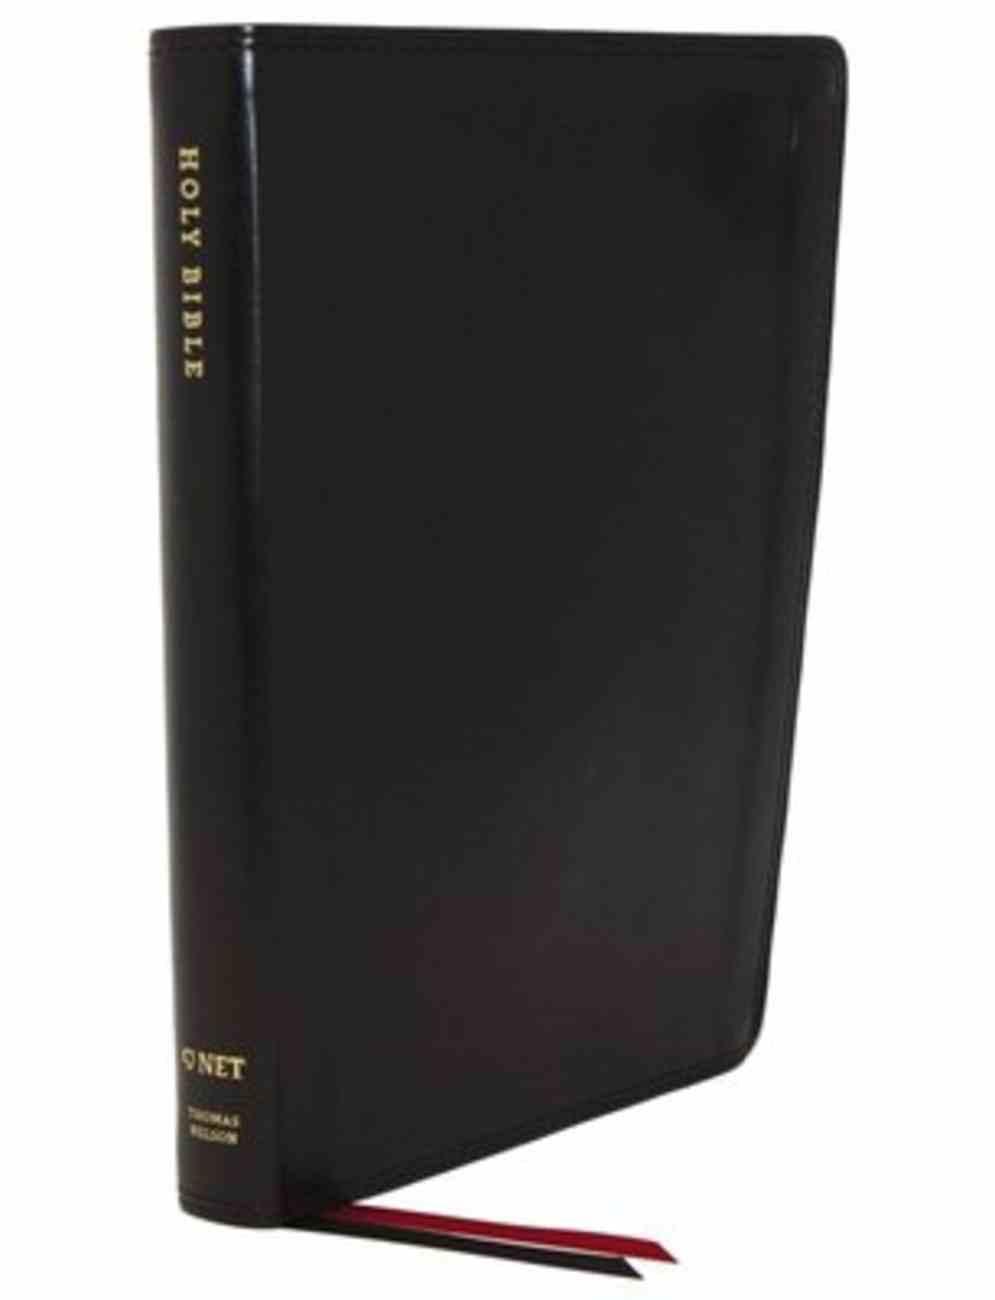 NET Bible Thinline Black Indexed Premium Imitation Leather